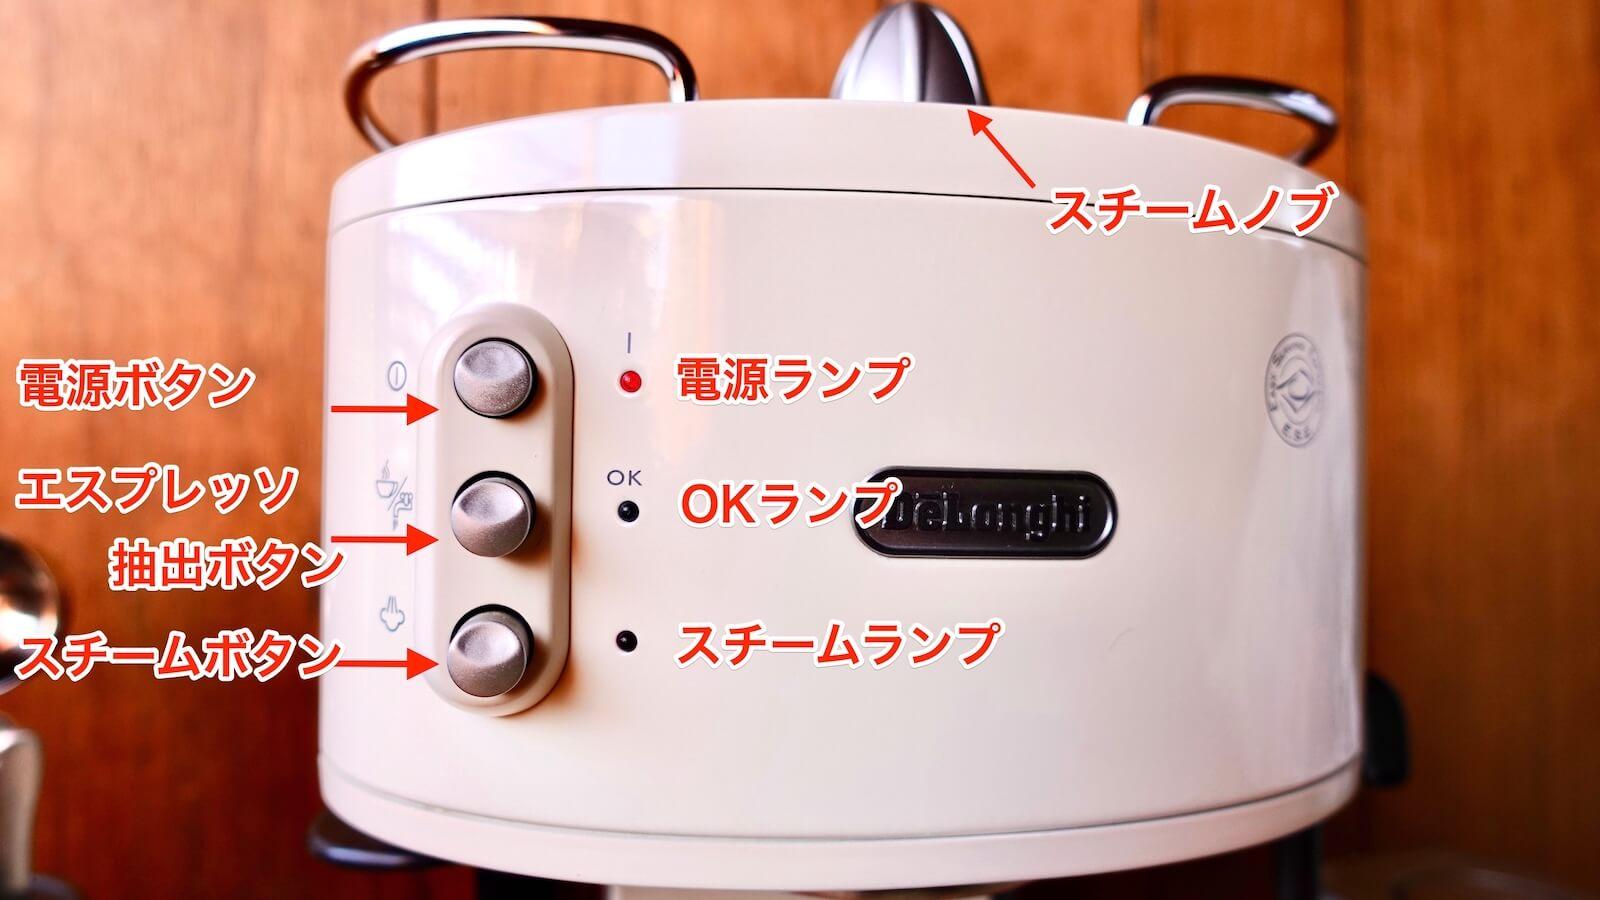 Delonghi espresso machine ECM300J operation panel and lamp